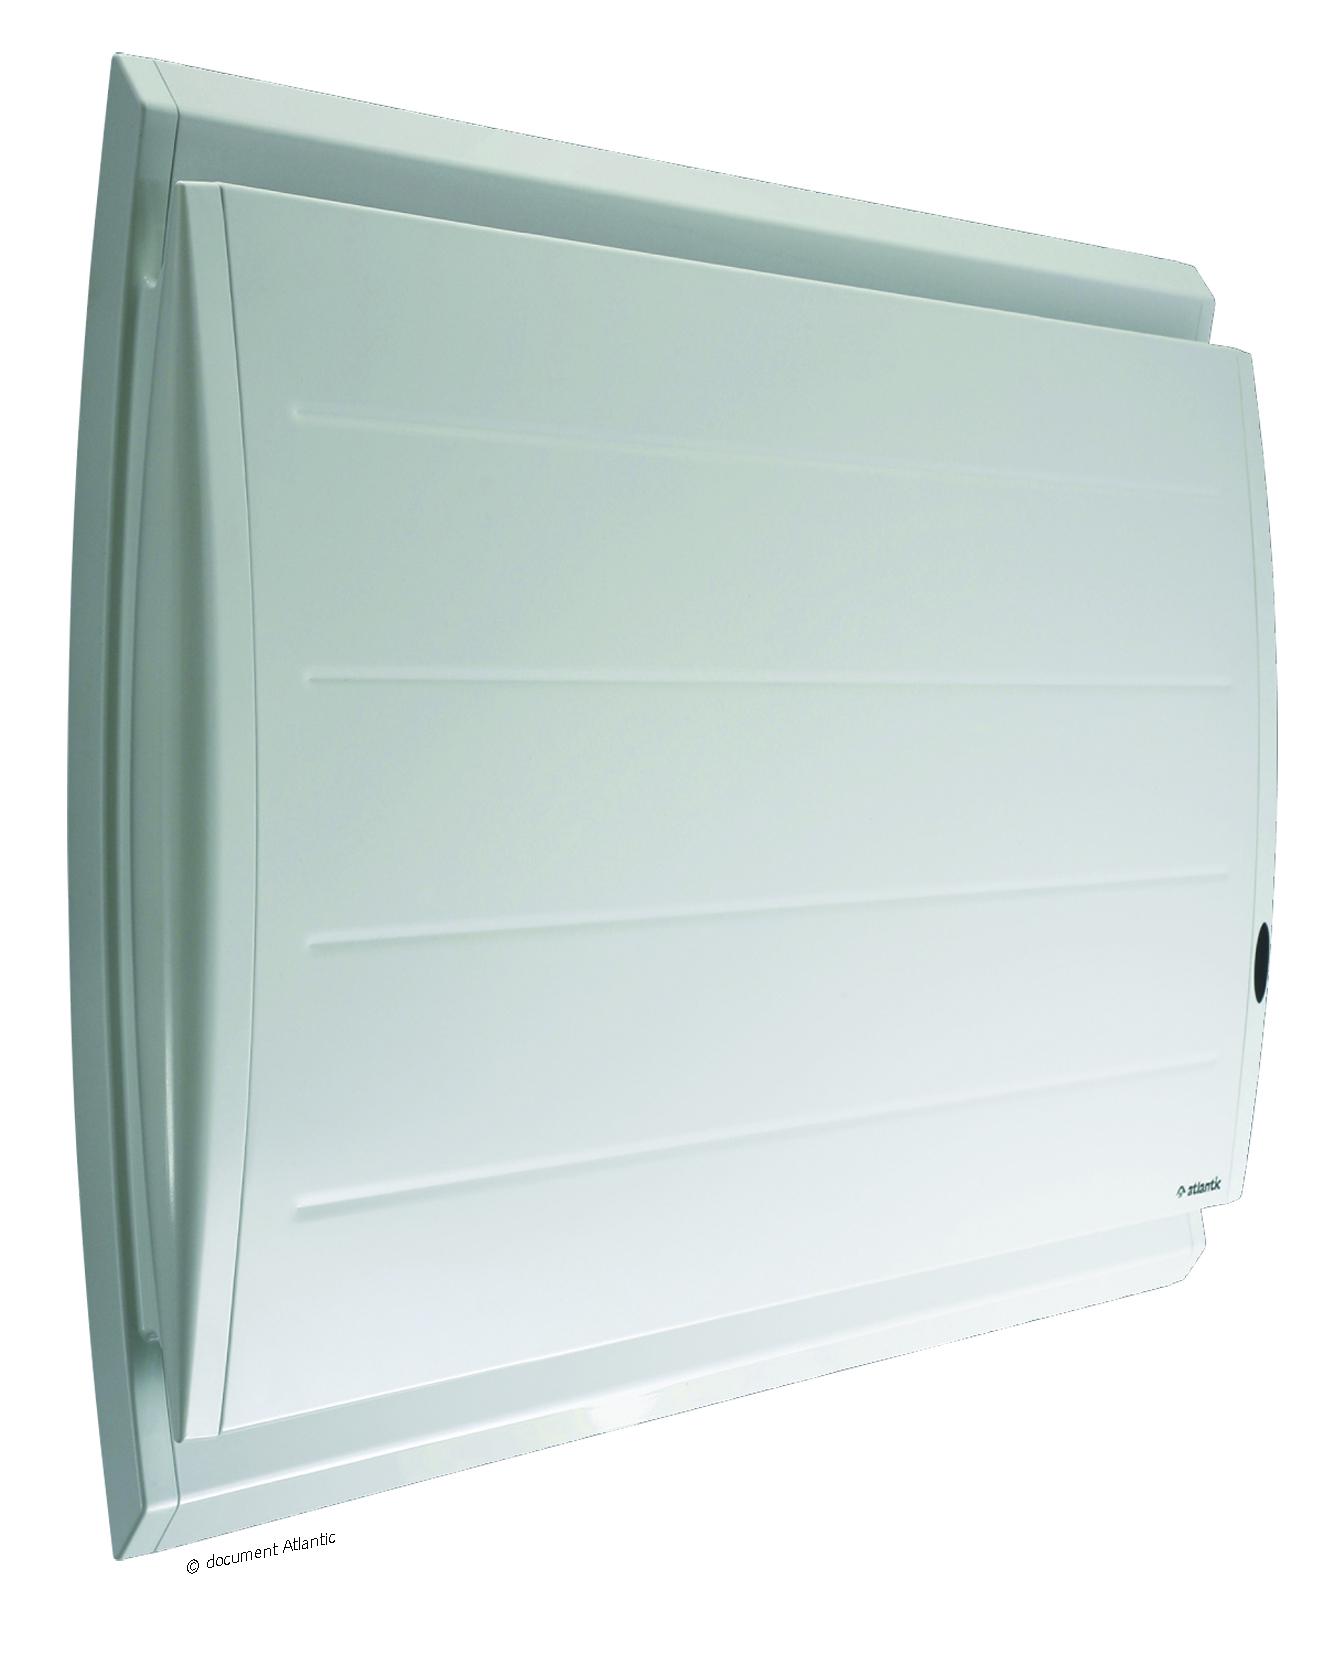 radiateur inertie atlantic radiateur inertie ma tris e maradja. Black Bedroom Furniture Sets. Home Design Ideas